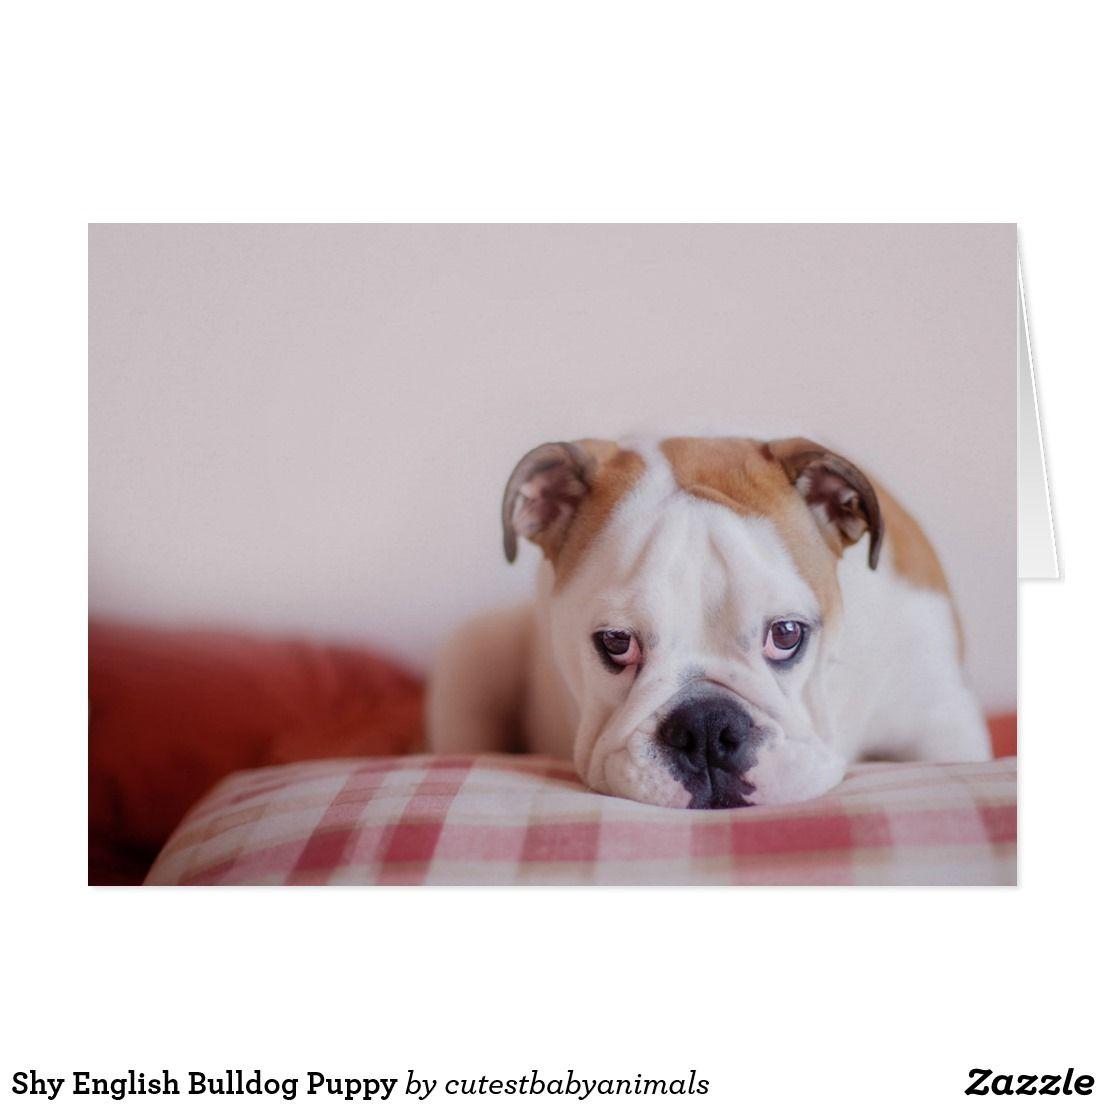 Shy English Bulldog Puppy Zazzle Com Bulldogs German Shepards